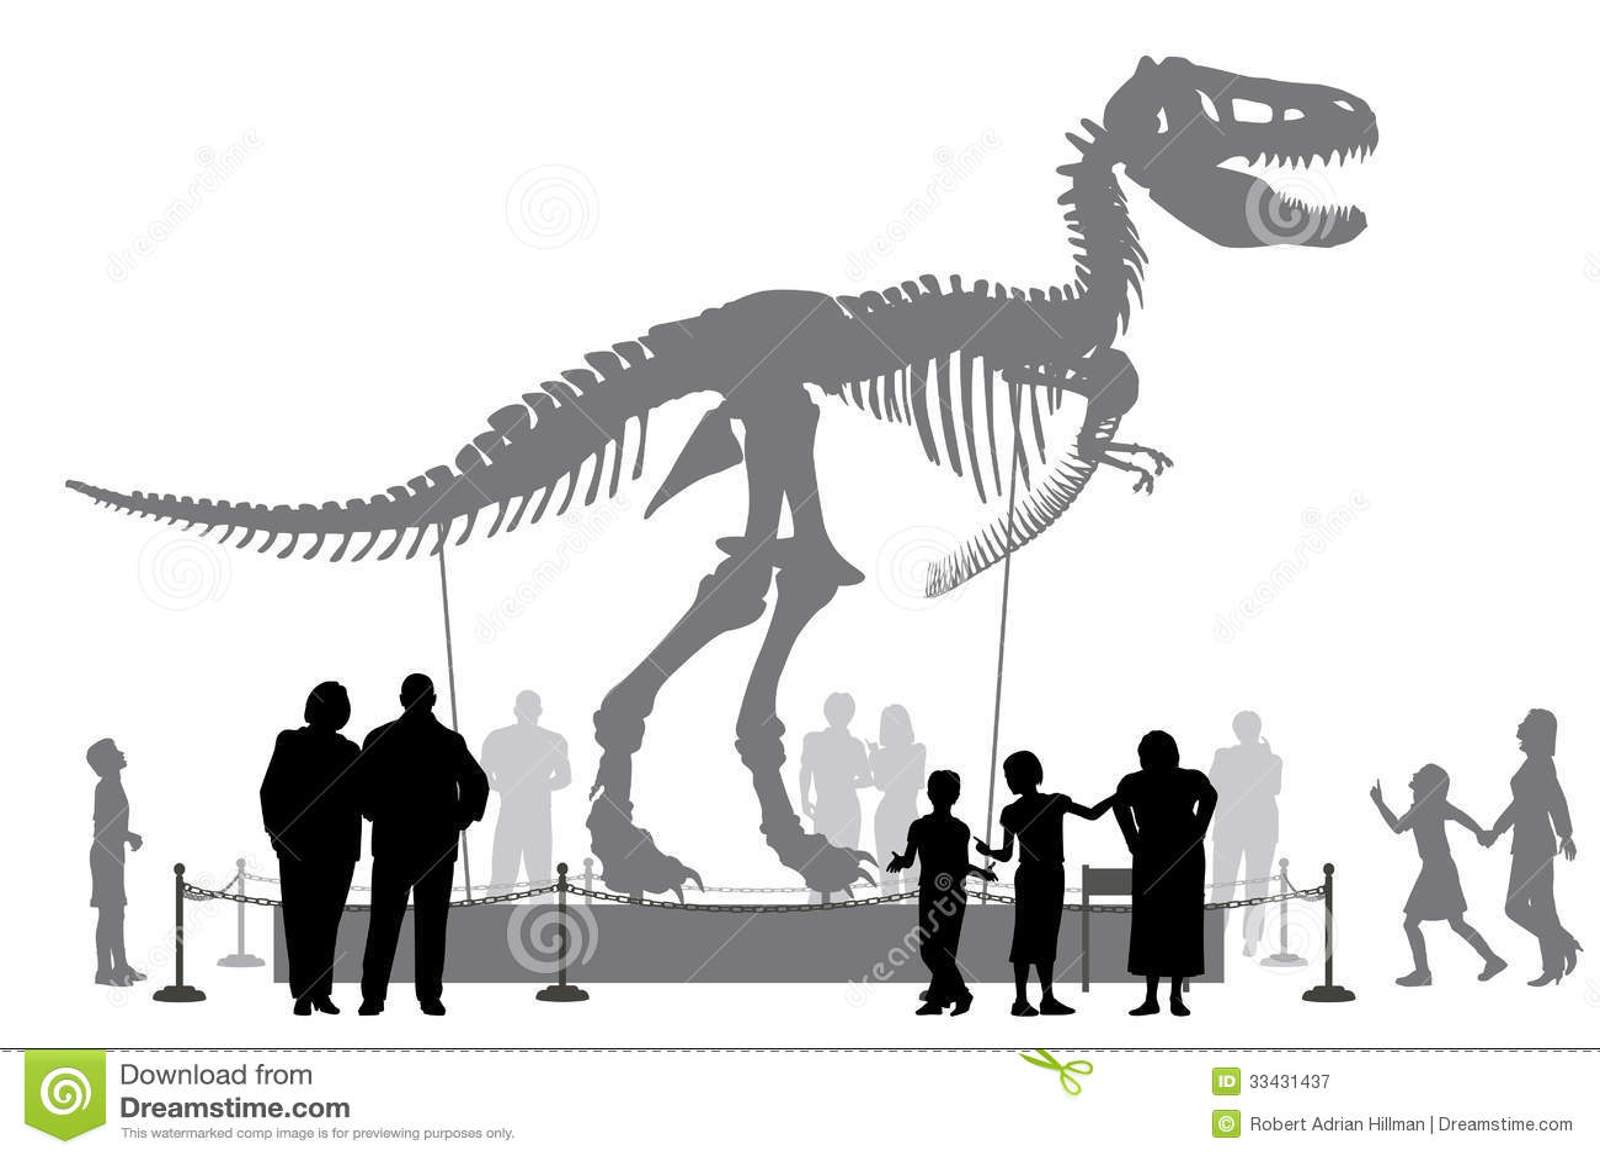 of people looking at a Tyrannosaurus rex skeleton in a museumTyrannosaurus Skeleton In Museum